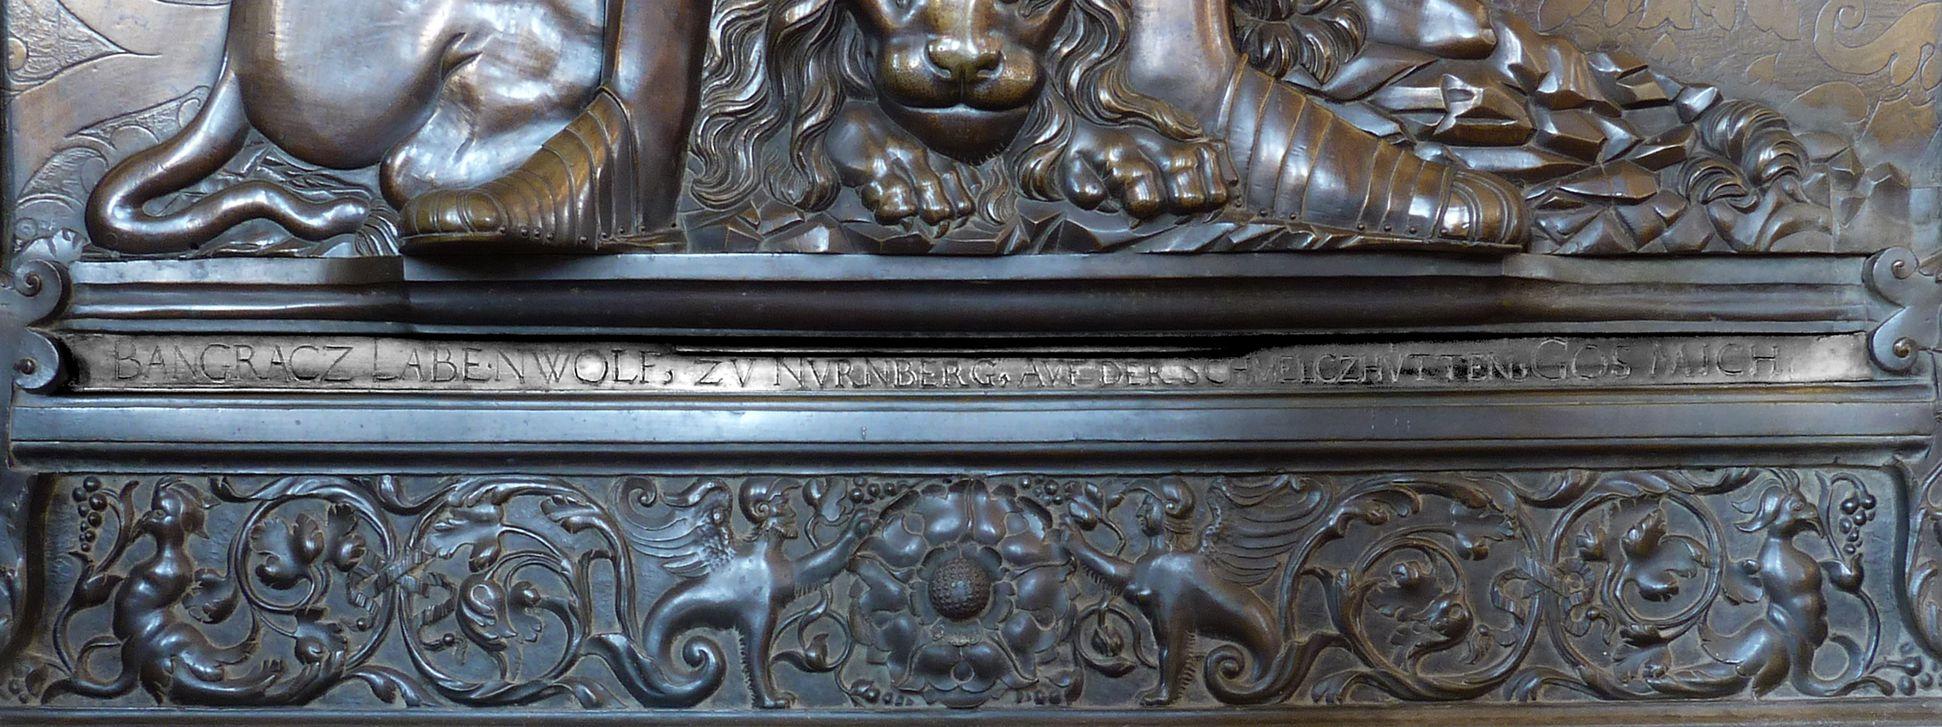 "Epitaph of Gottfried Werner Count of Zimmern (Meßkirch, Baden-Württemberg) Lower edge of the epitaph with the inscription: ""BANGRACZ LABENWOLF, ZV NVRNBERG, AVF DER SCHMELCZHVETTEN, GOS MICH"" cast by Pankraz Labenwolf in Nuremberg"